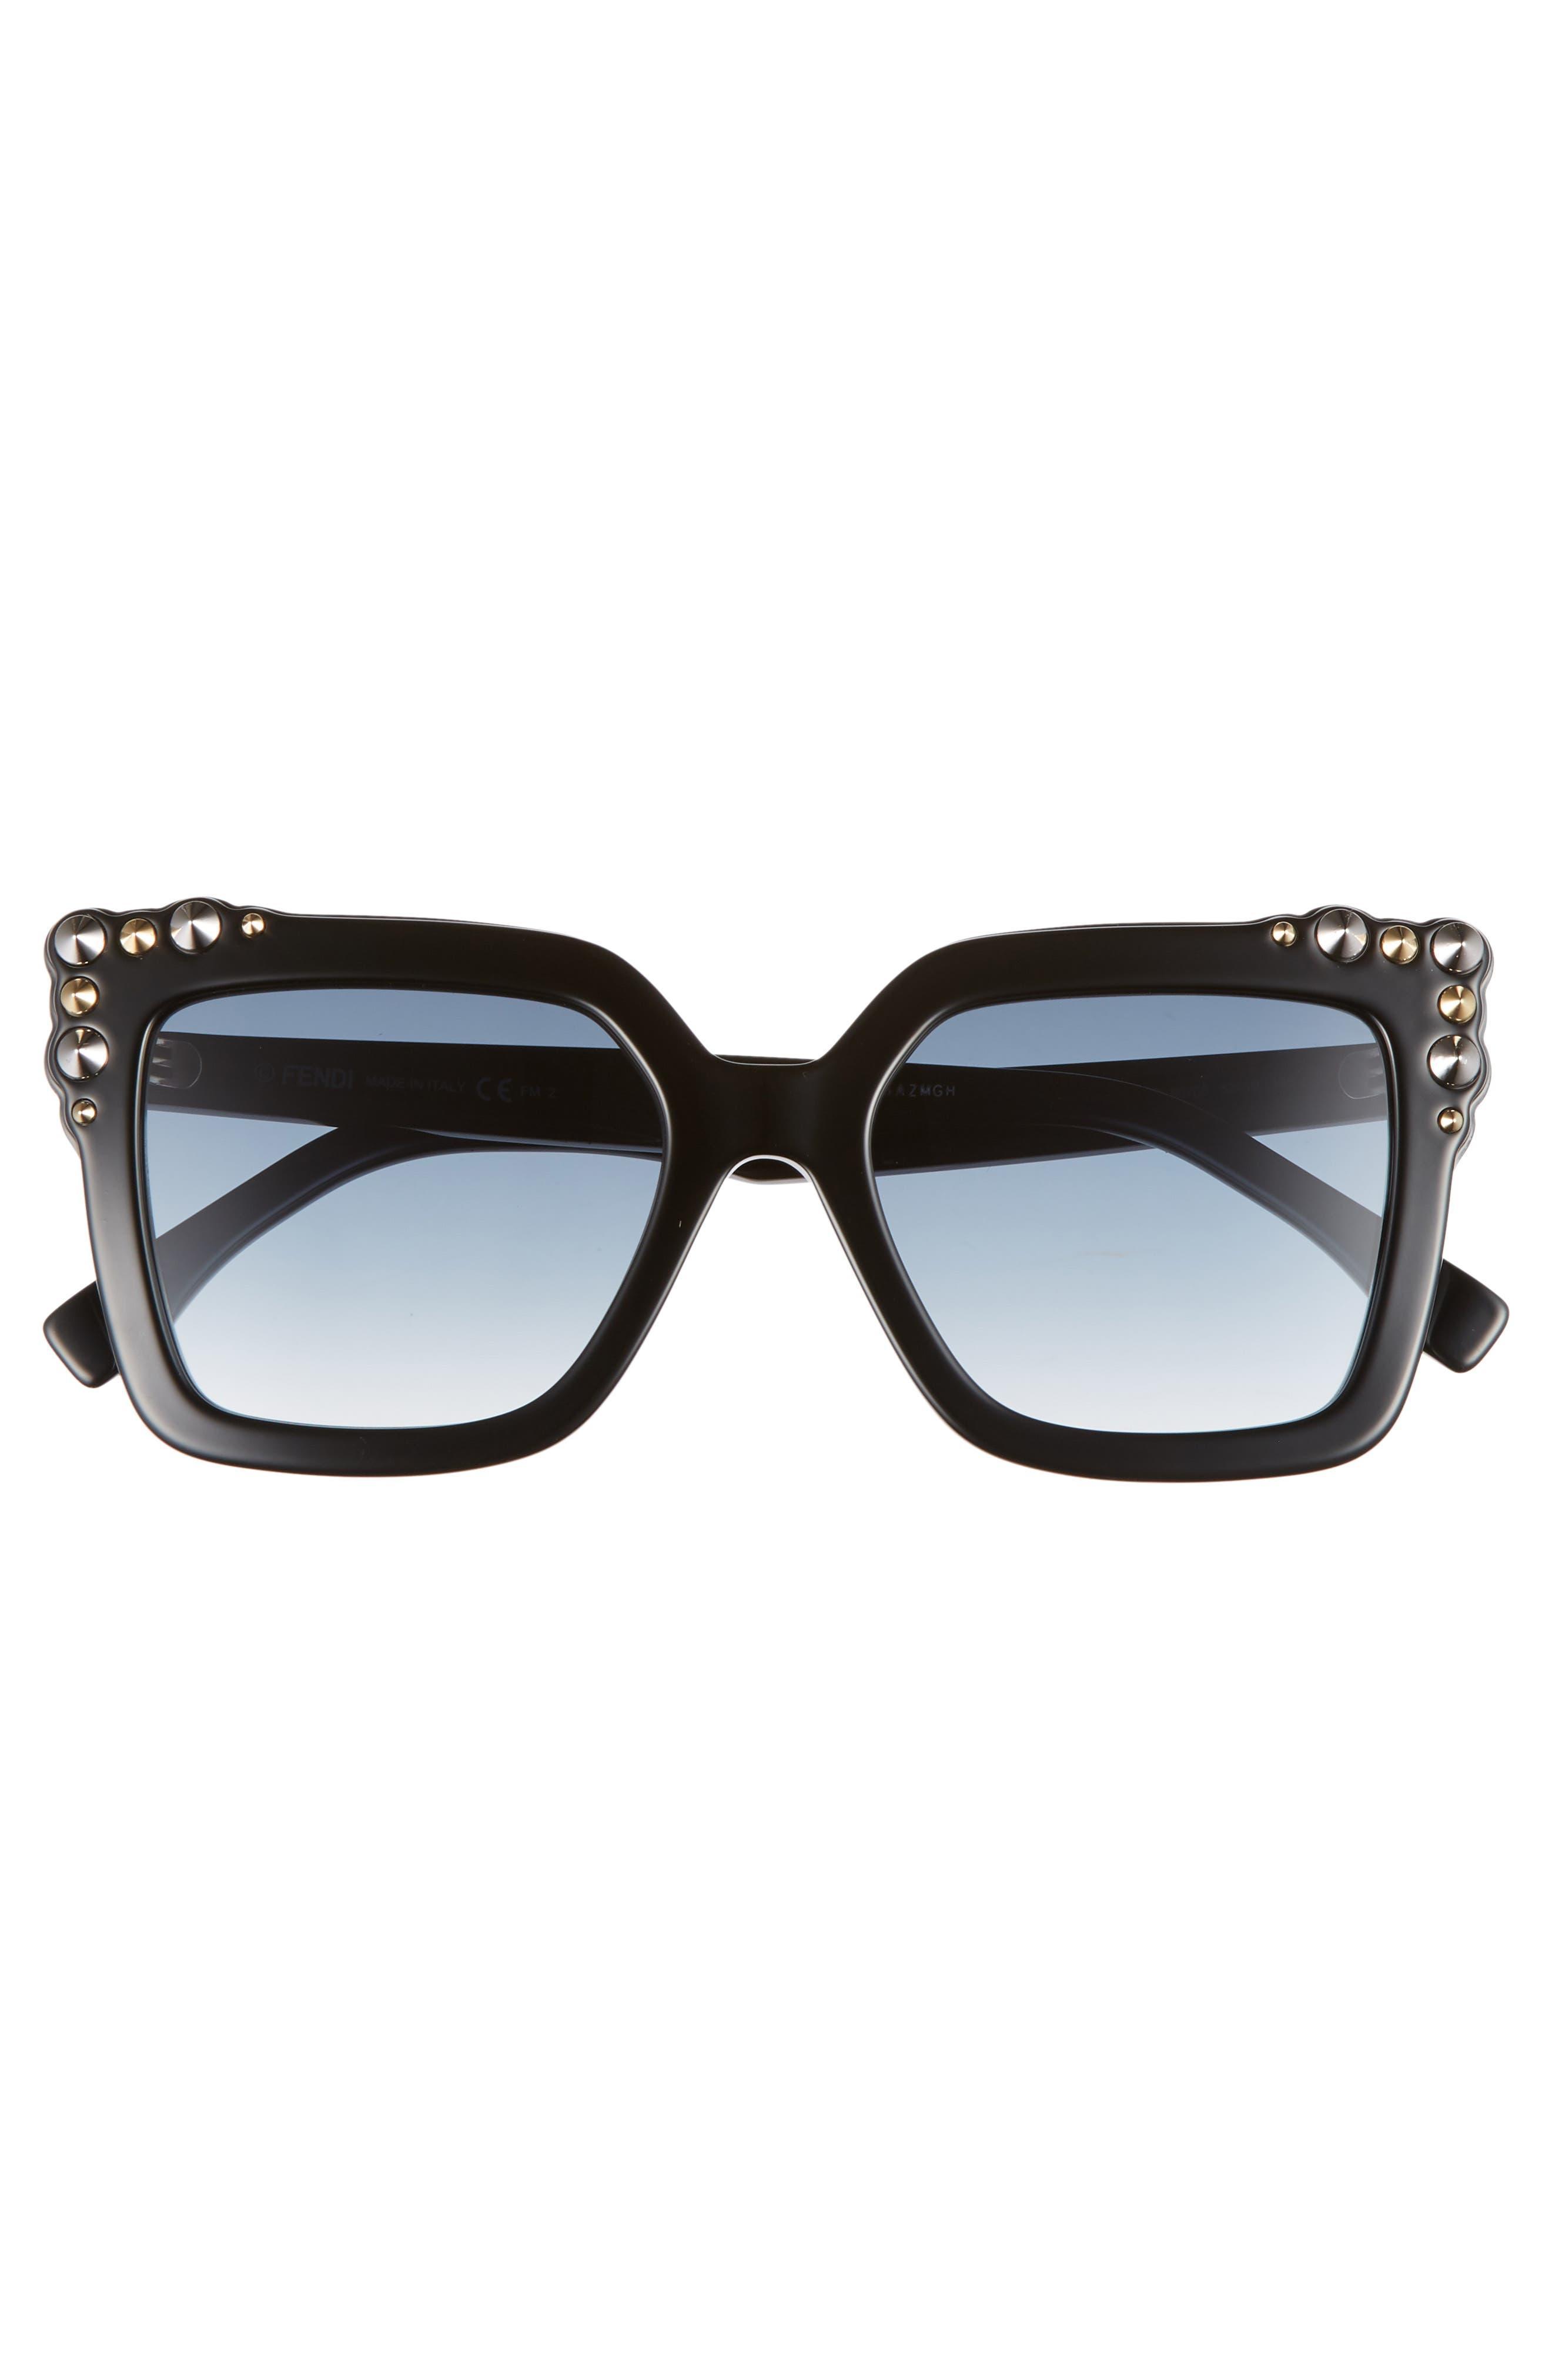 52mm Gradient Cat Eye Sunglasses,                             Alternate thumbnail 3, color,                             002